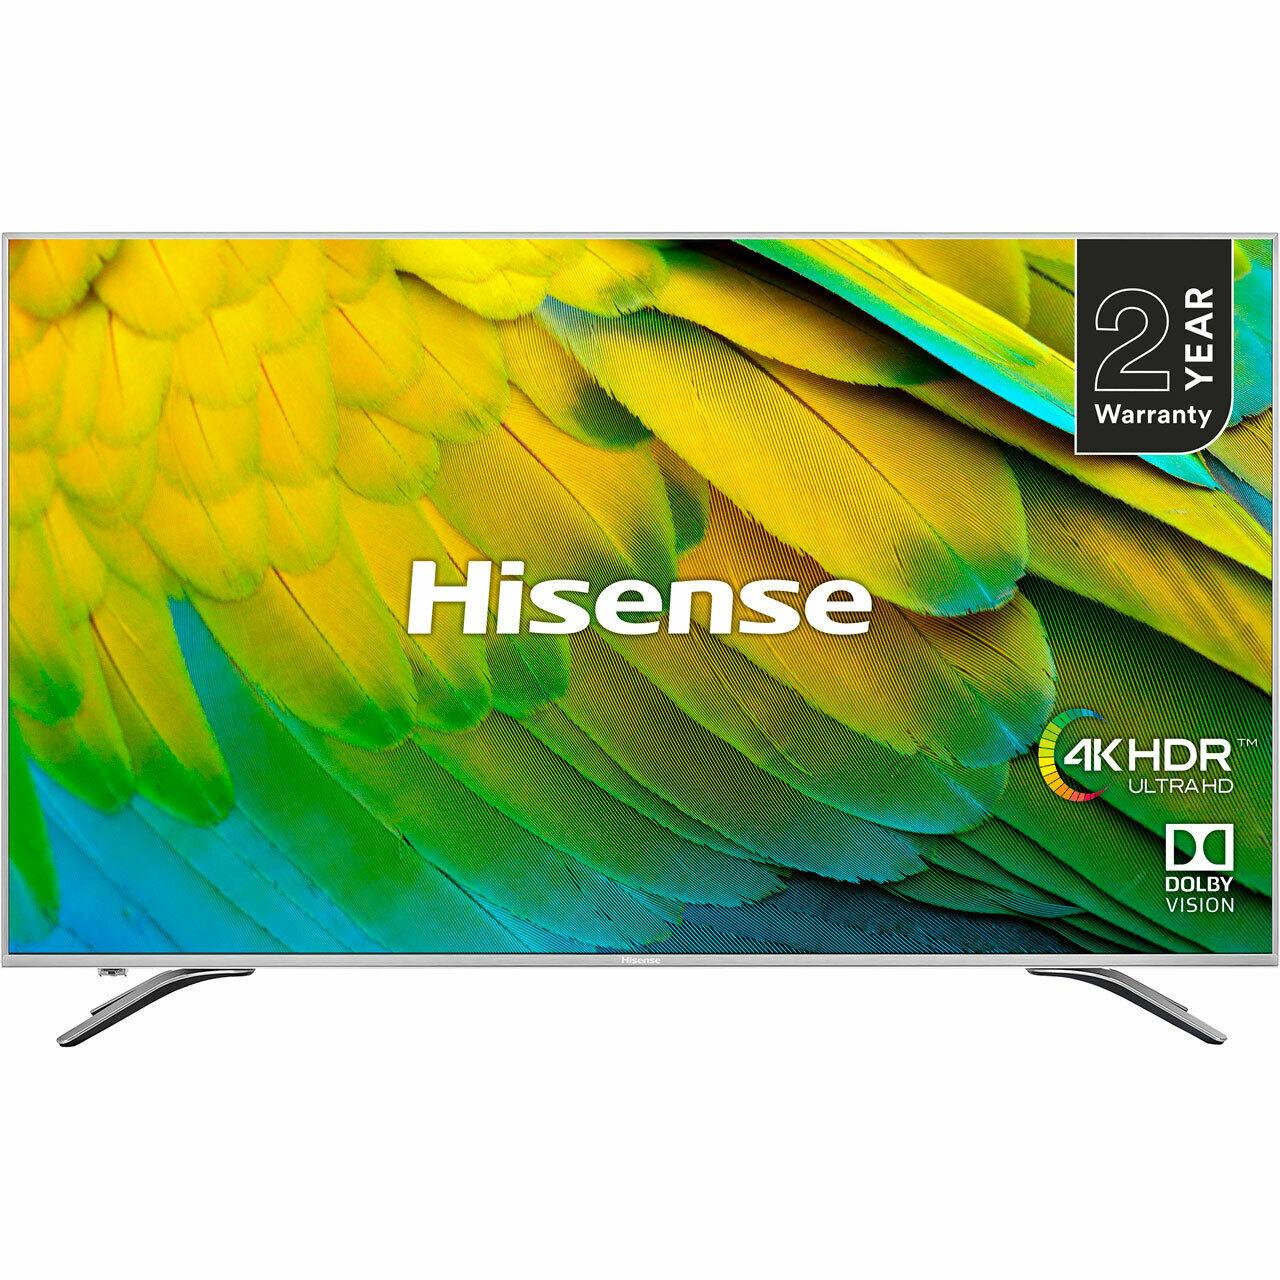 Hisense H75B7510UK B7510 75 Inch TV Smart 4K Ultra HD LED Freeview HD 4 HDMI with code £924 @ AO-Ebay